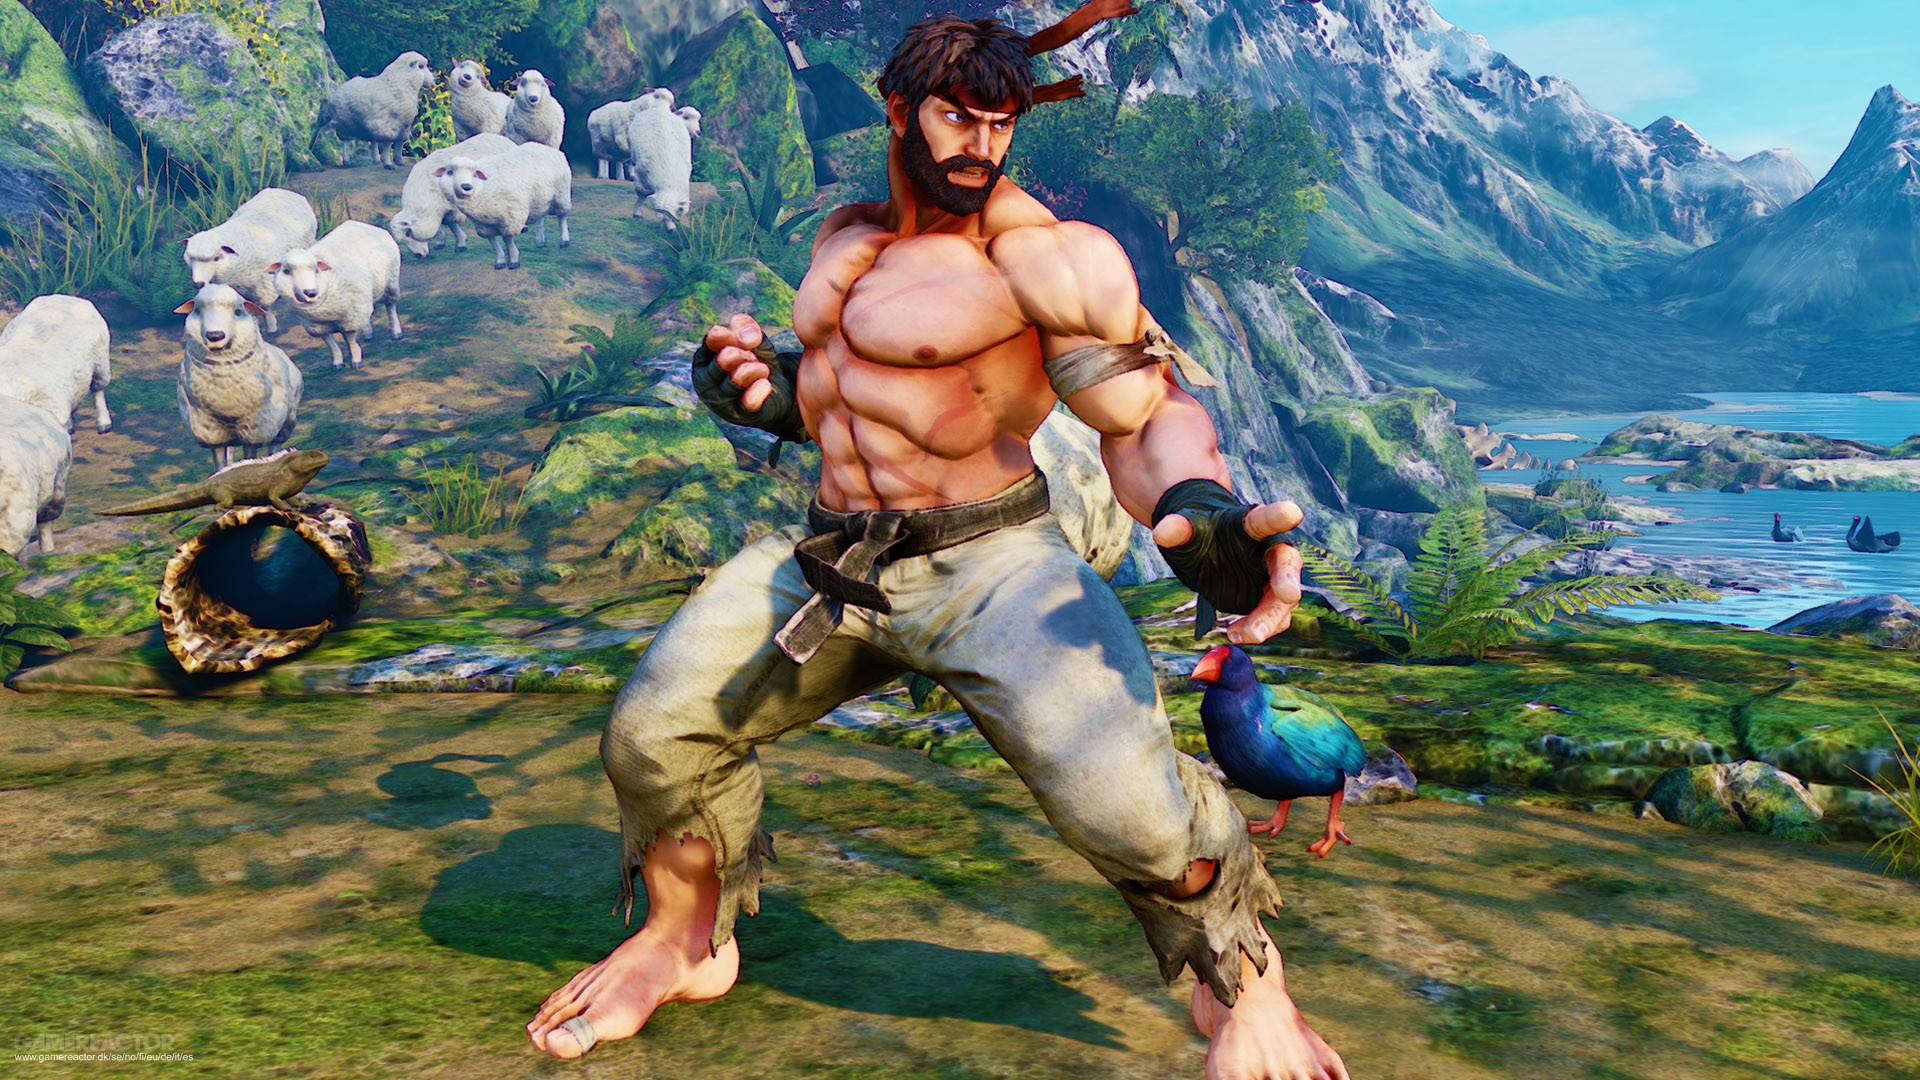 Pictures Of Hot Ryu Pre Order Bonus For Street Fighter V 2 8